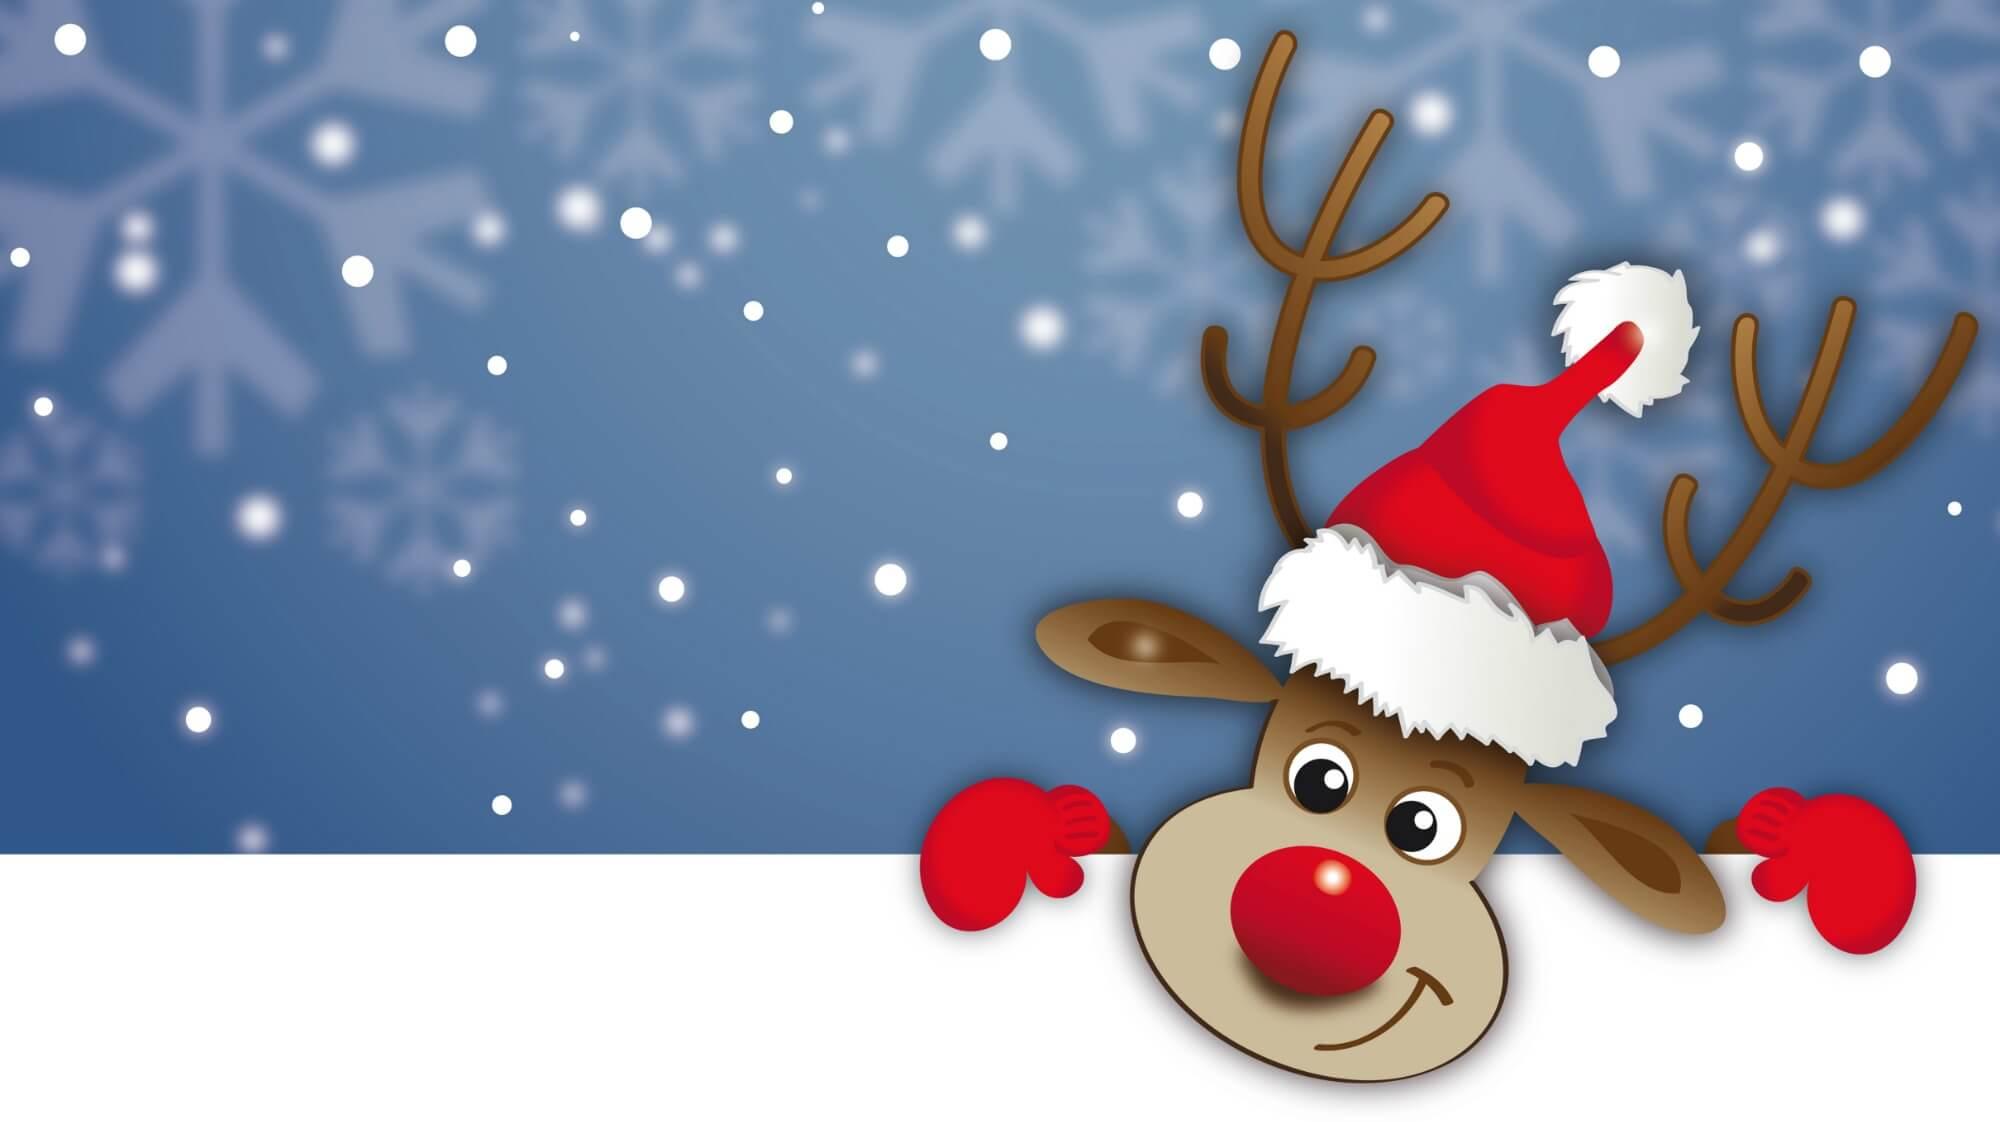 Merry Gluten Free Christmas